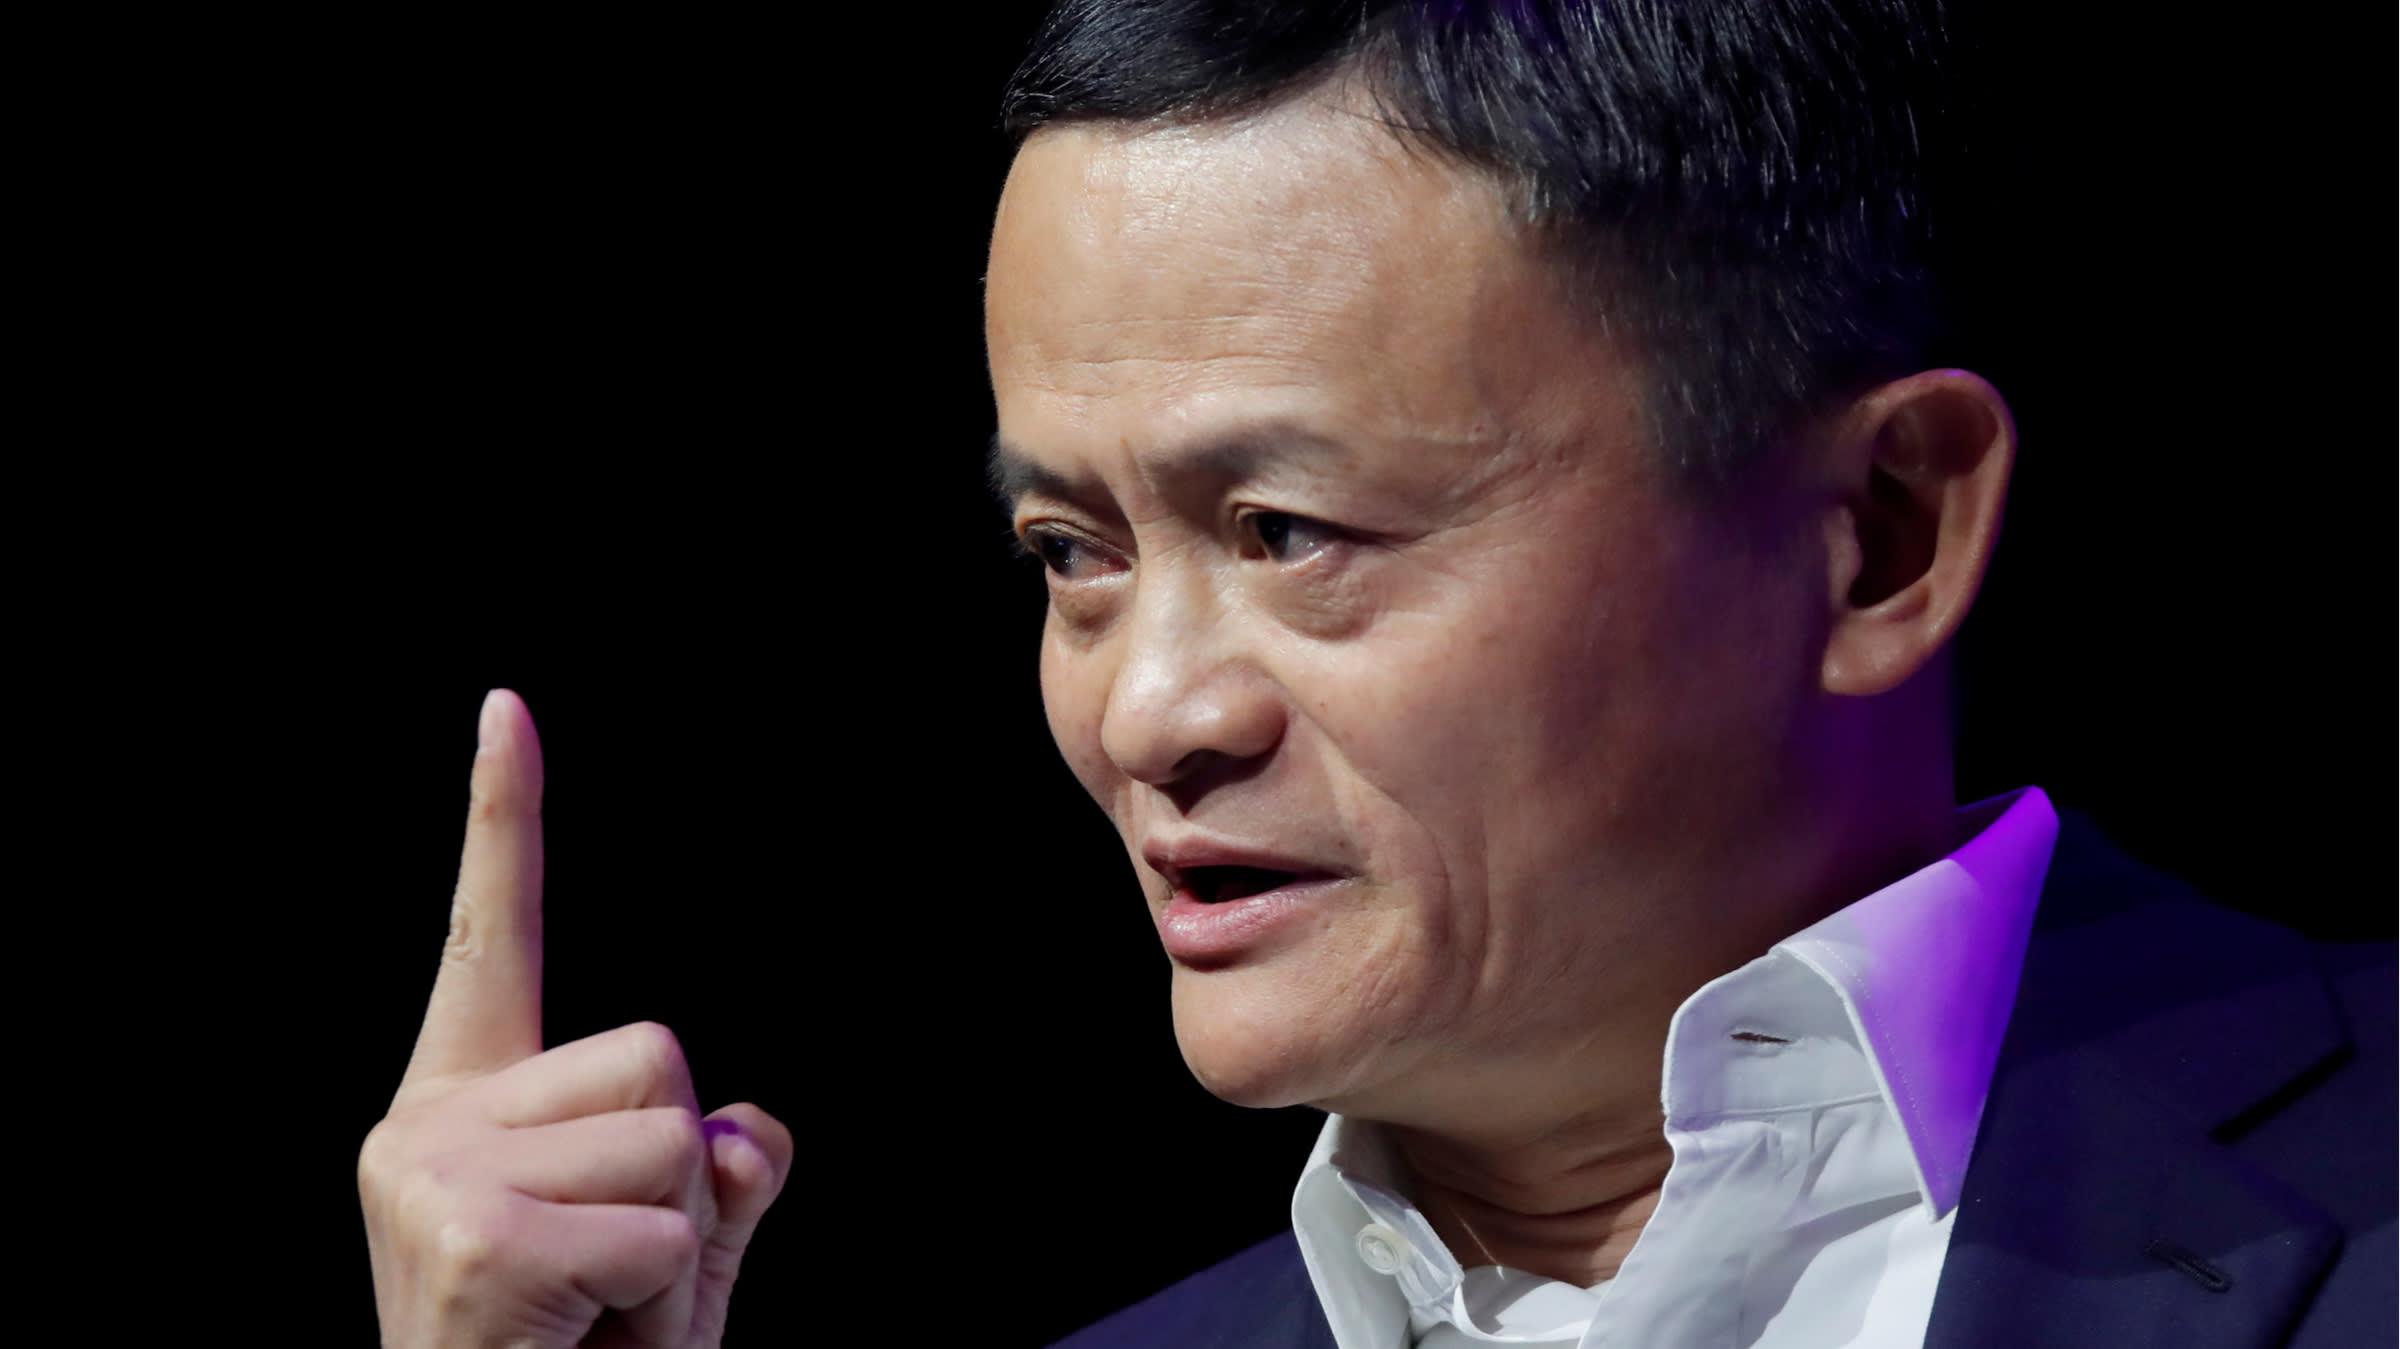 Alibaba antitrust fine shows Beijing views tech giant as threat -                         Nikkei Asia                         ArrowArtboardArtboardTitle ChevronTitle ChevronIcon FacebookIcon LinkedinIcon Mail ContactPath LayerIcon MailPositive ArrowIcon PrintIcon Twitter